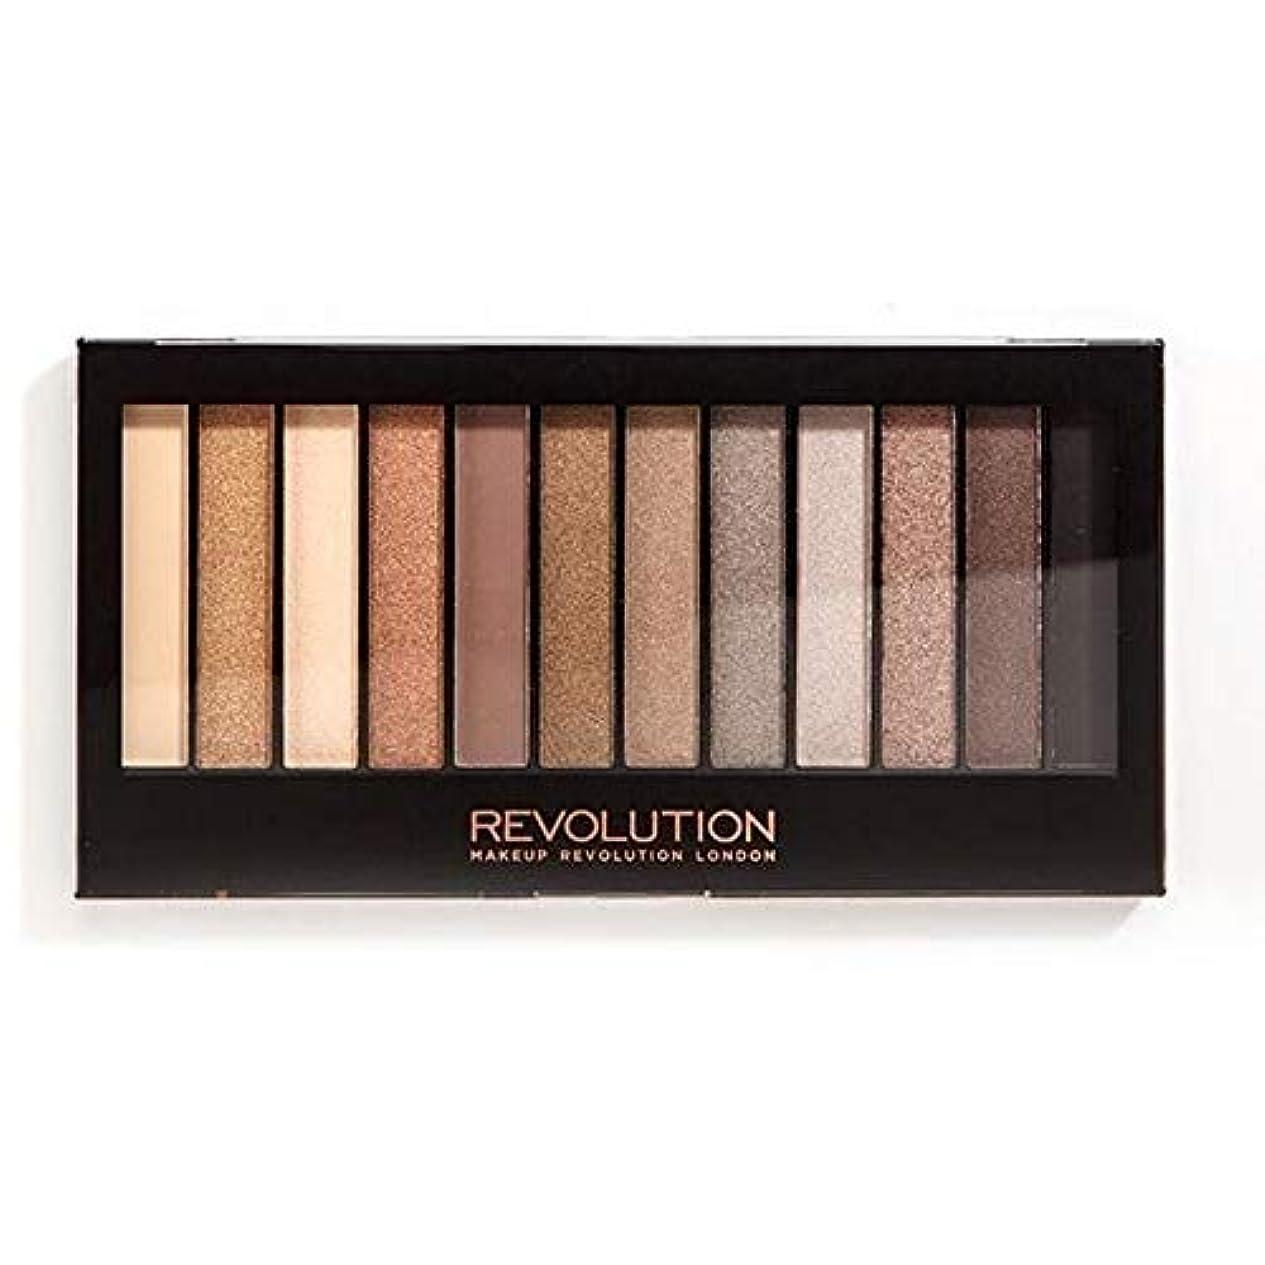 [Revolution ] 回転償還象徴的な2アイシャドウパレット - Revolution Redemption Iconic 2 Eye Shadow Palette [並行輸入品]